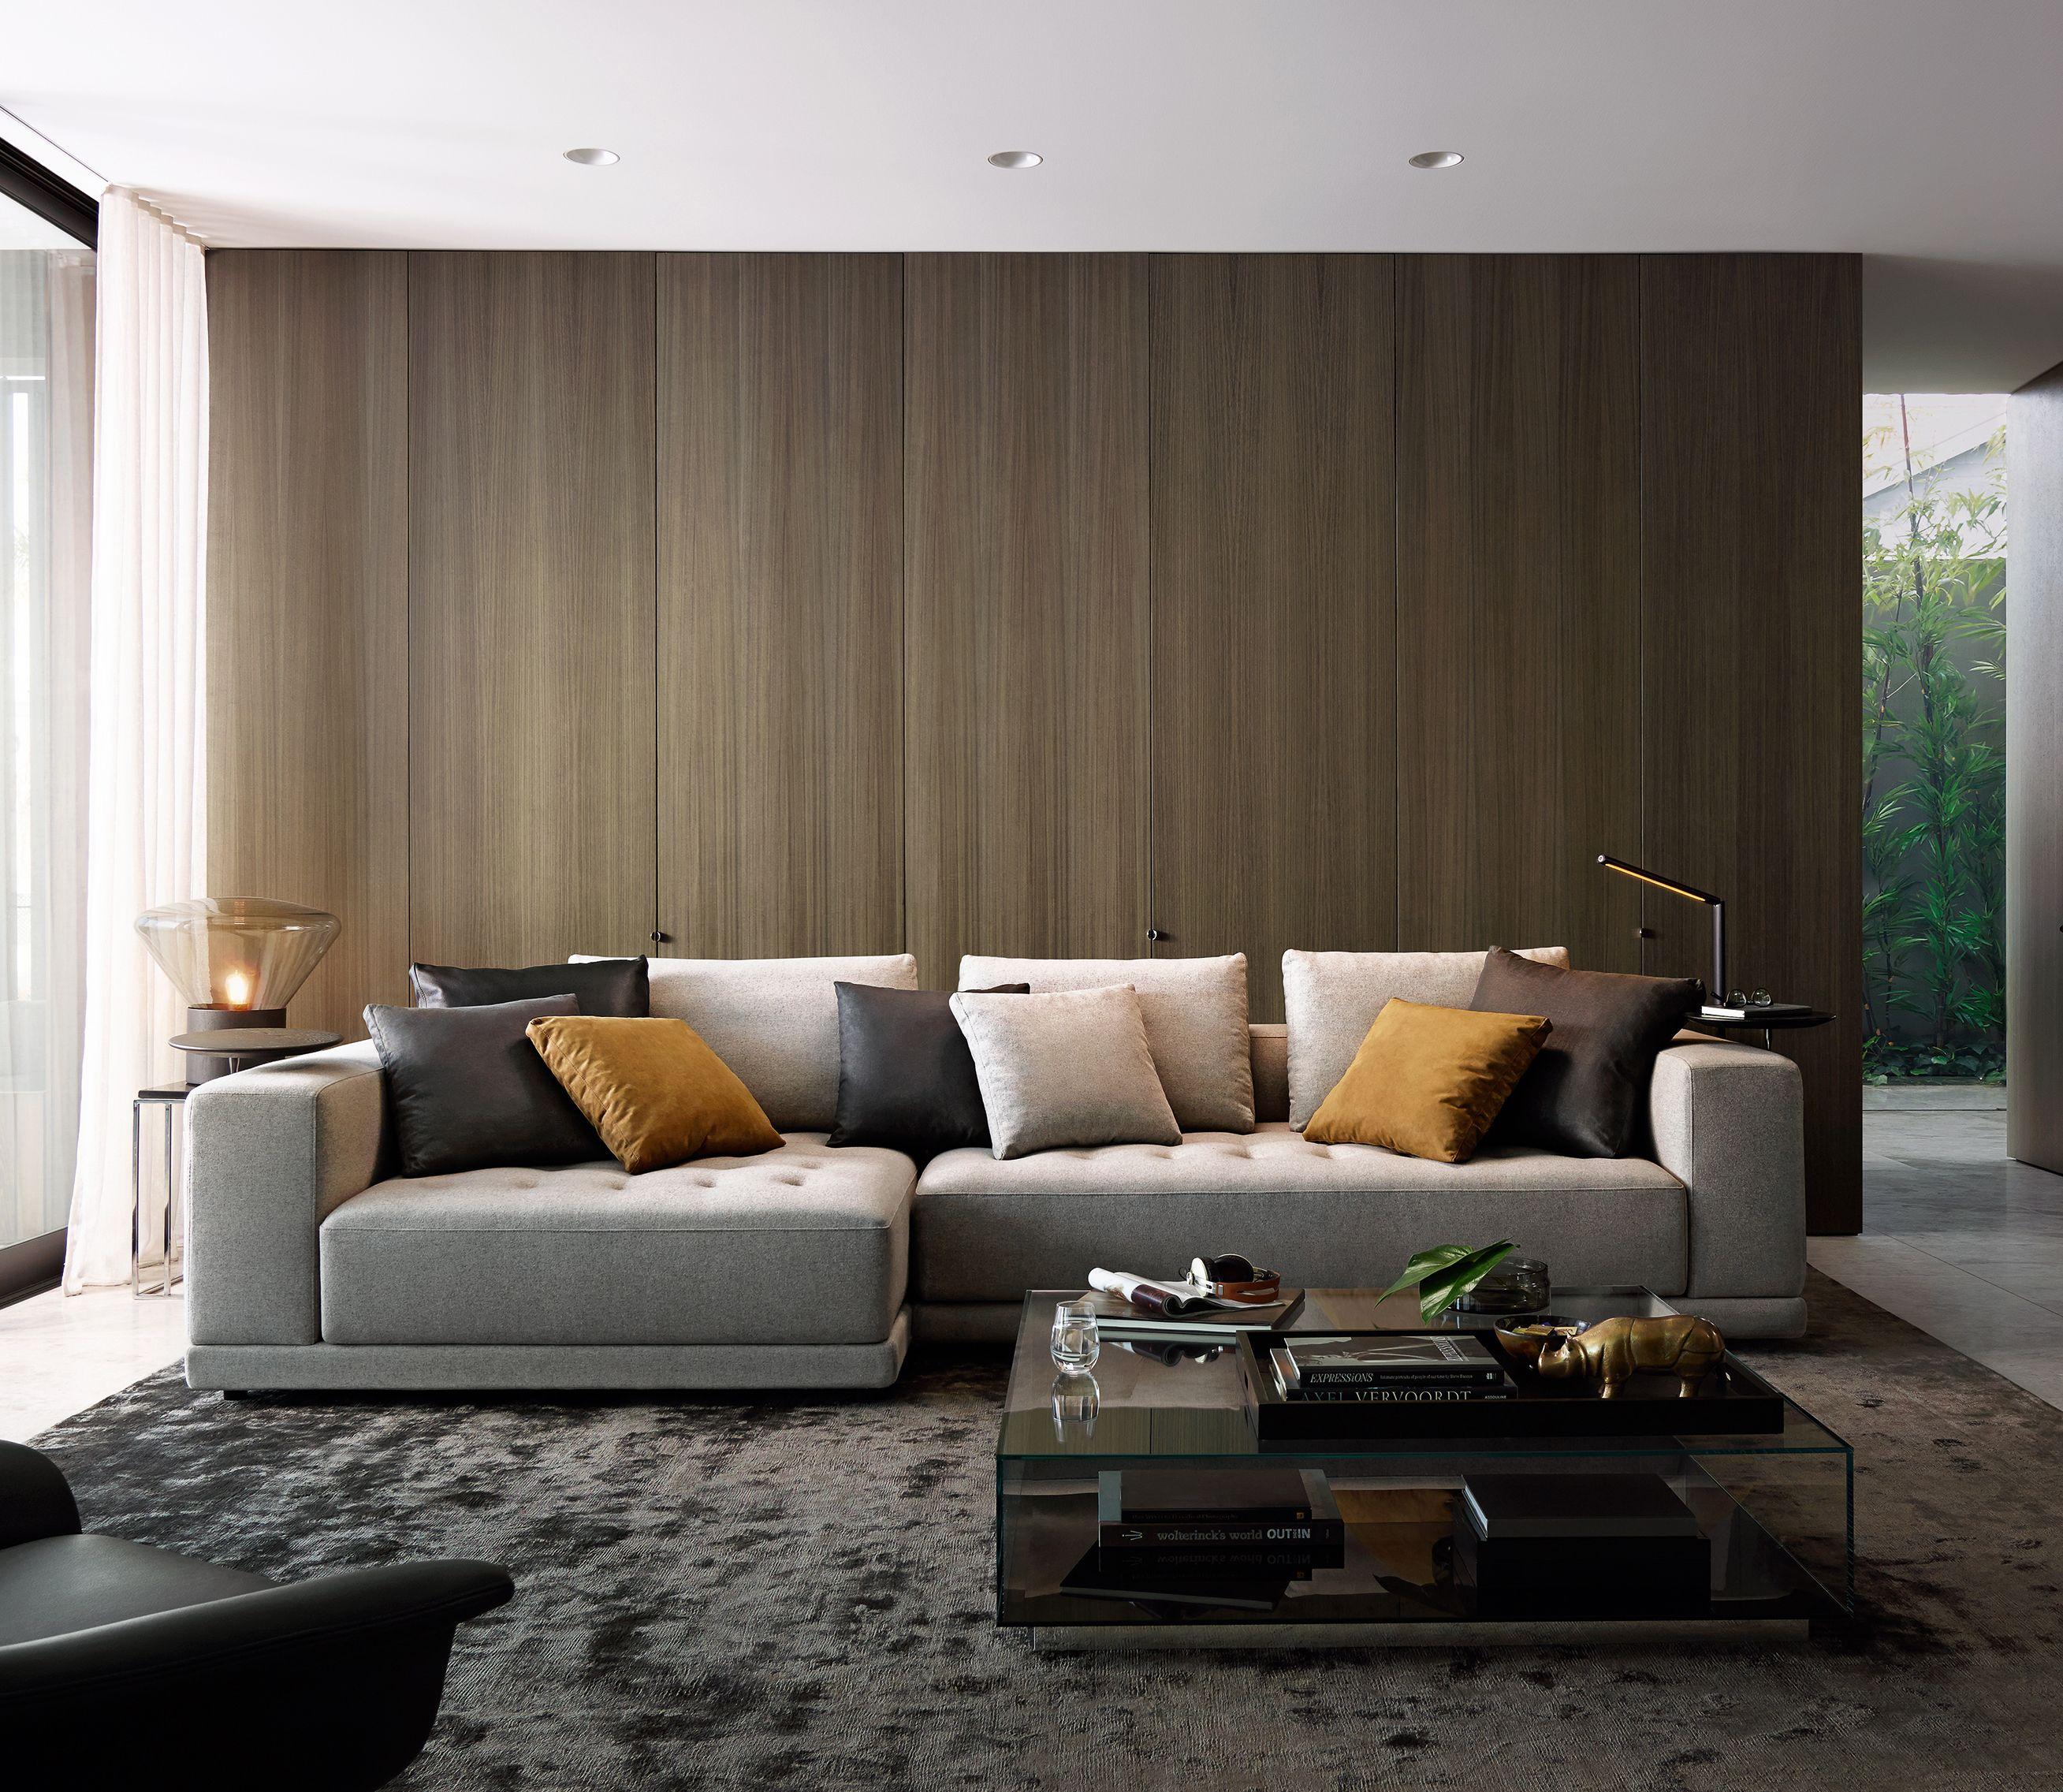 Modern Living Furniture Singapore King Furniture Contemporary Sofa Sofa Design